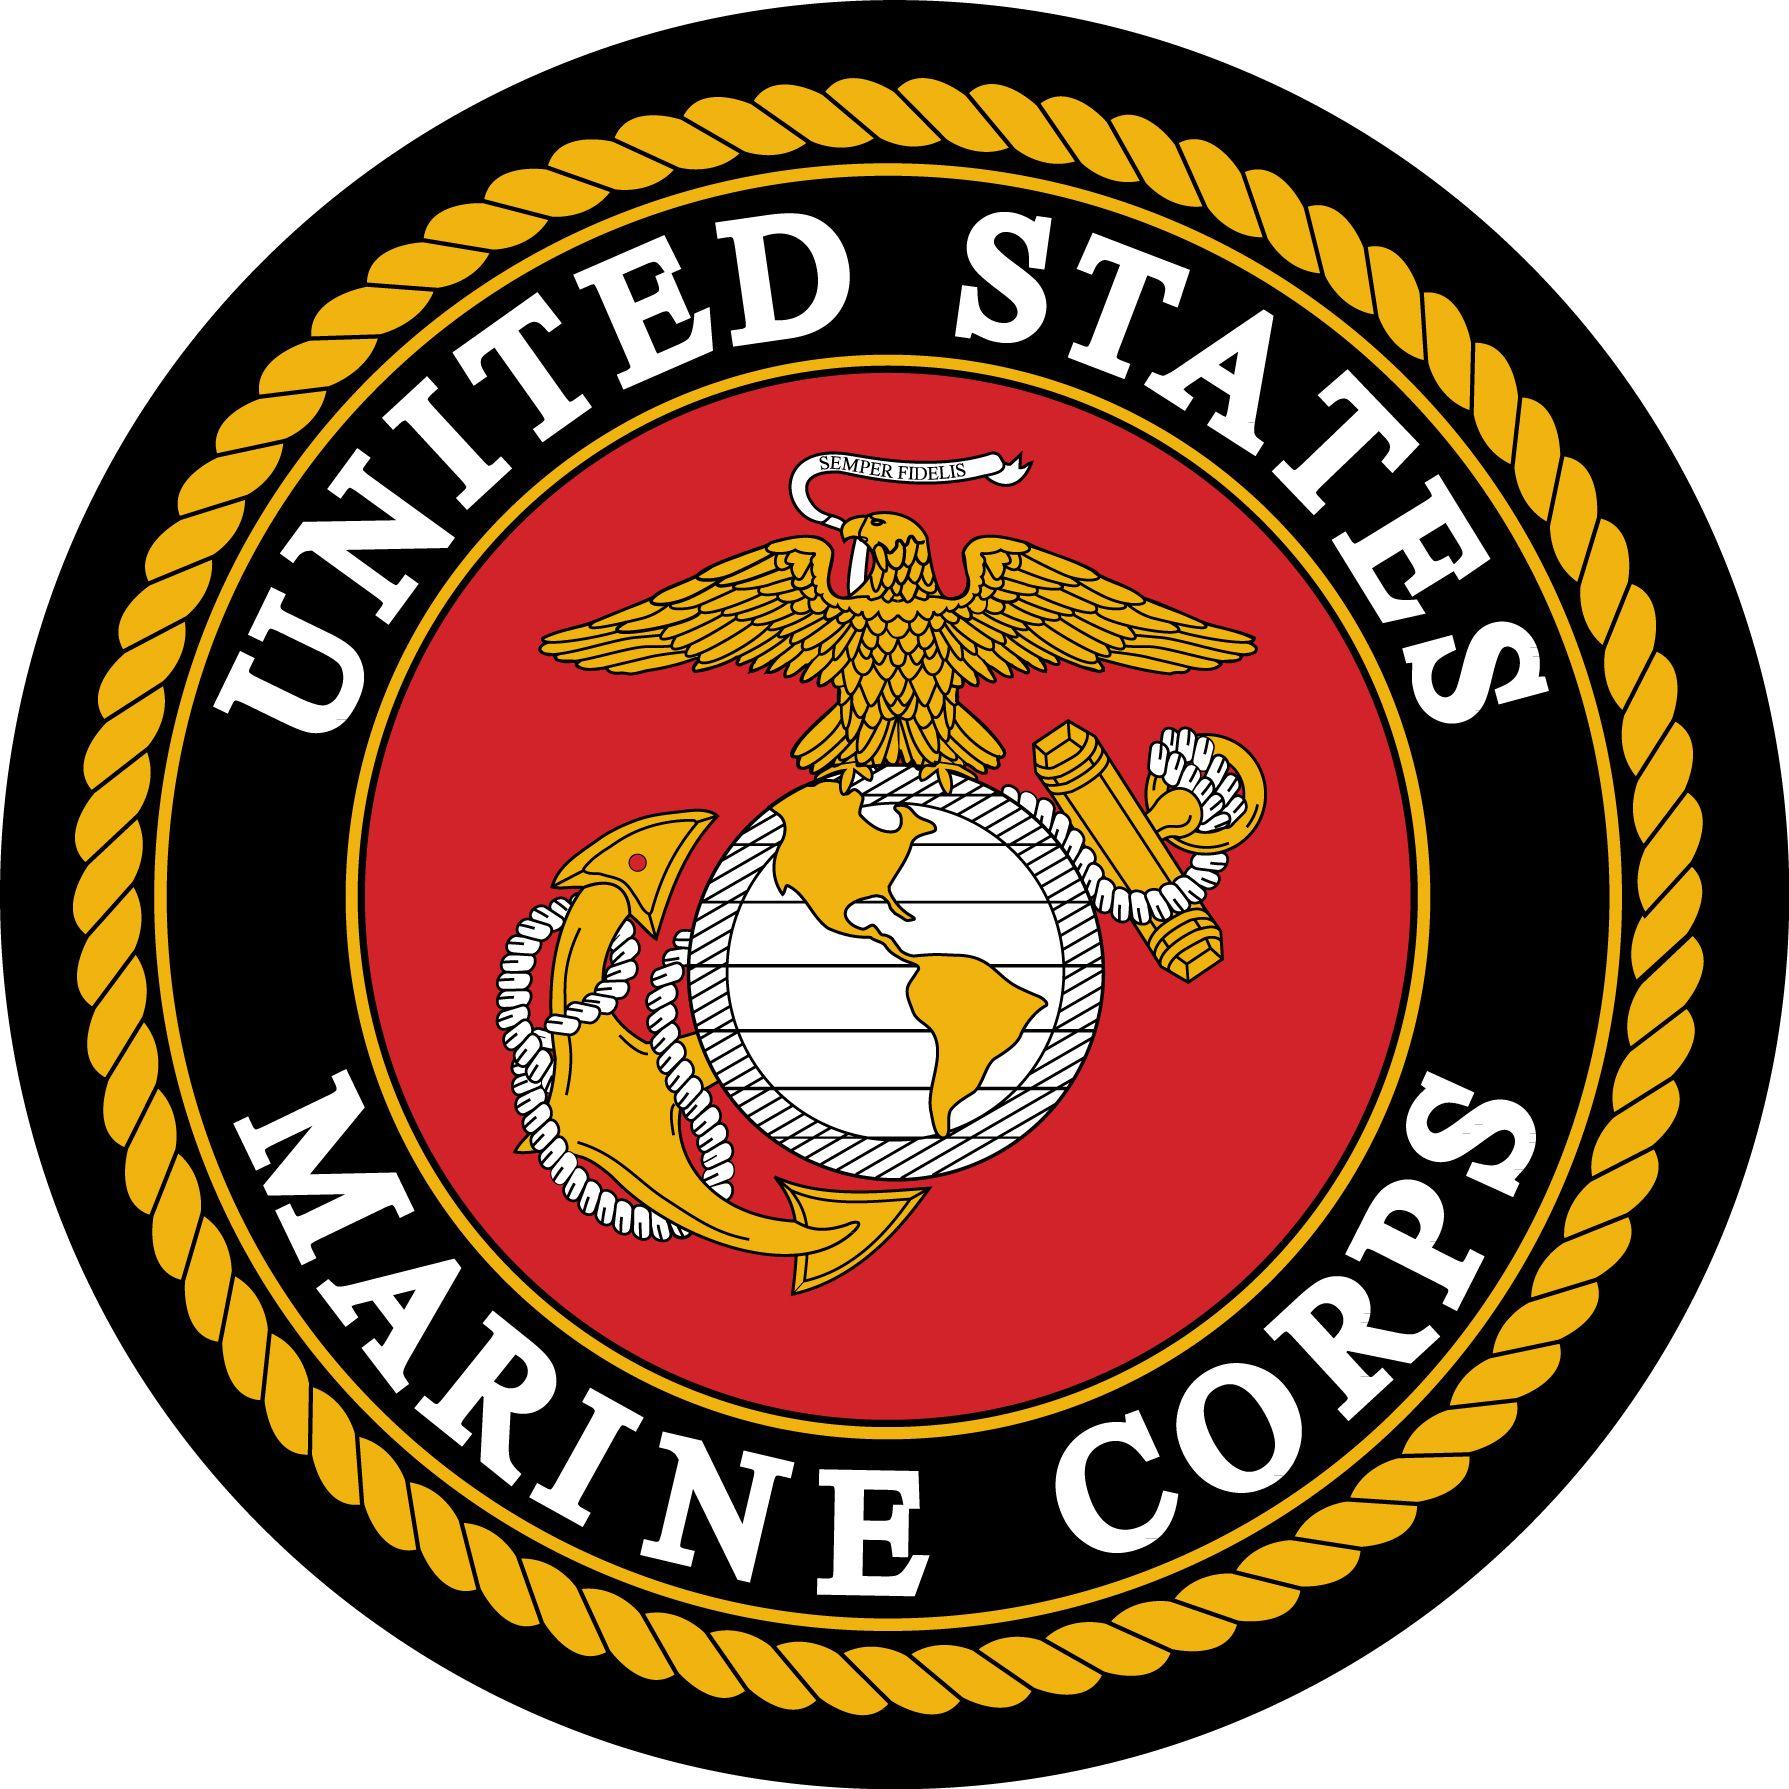 marine corp logo - Google Search   United states marine corps, Us marine  corps, Marine corps emblem